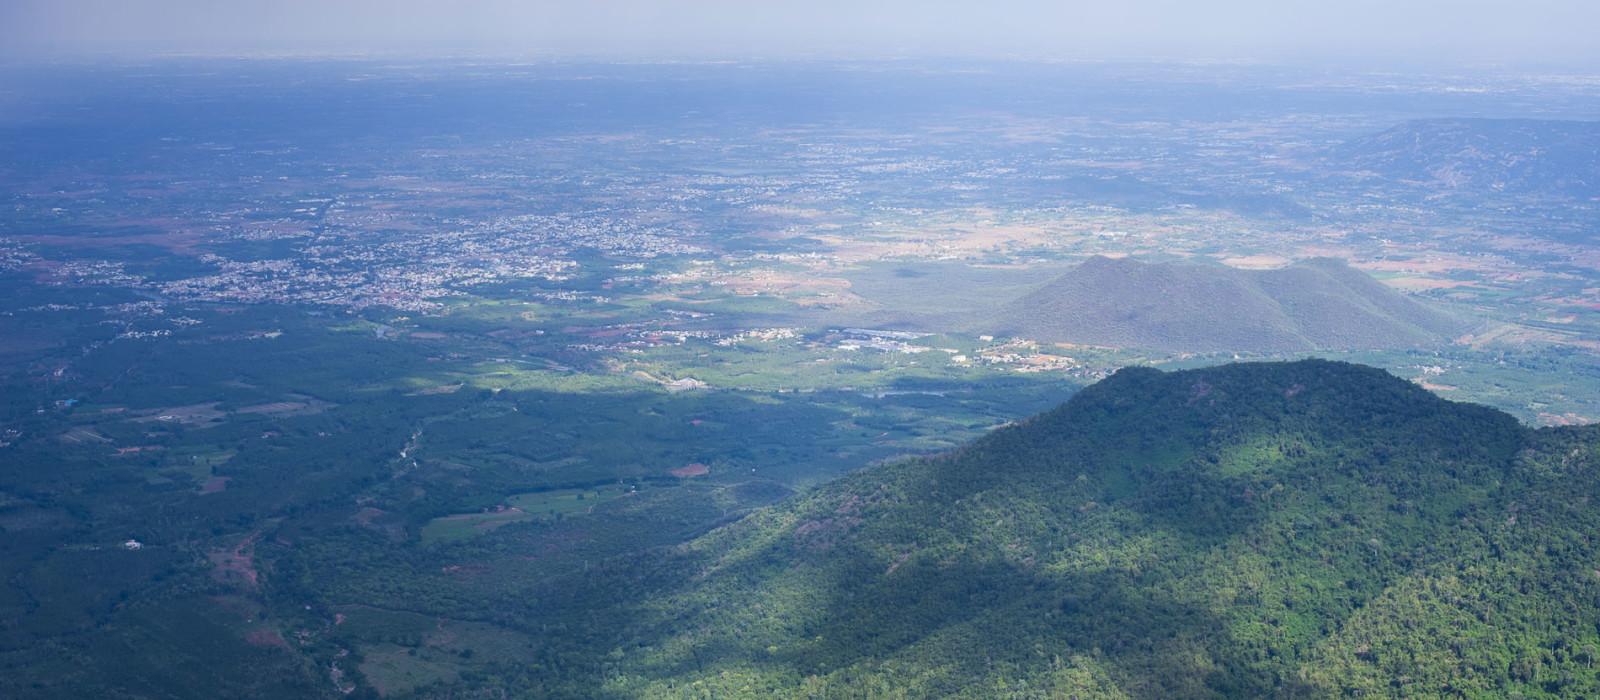 Reiseziel Coimbatore Südindien